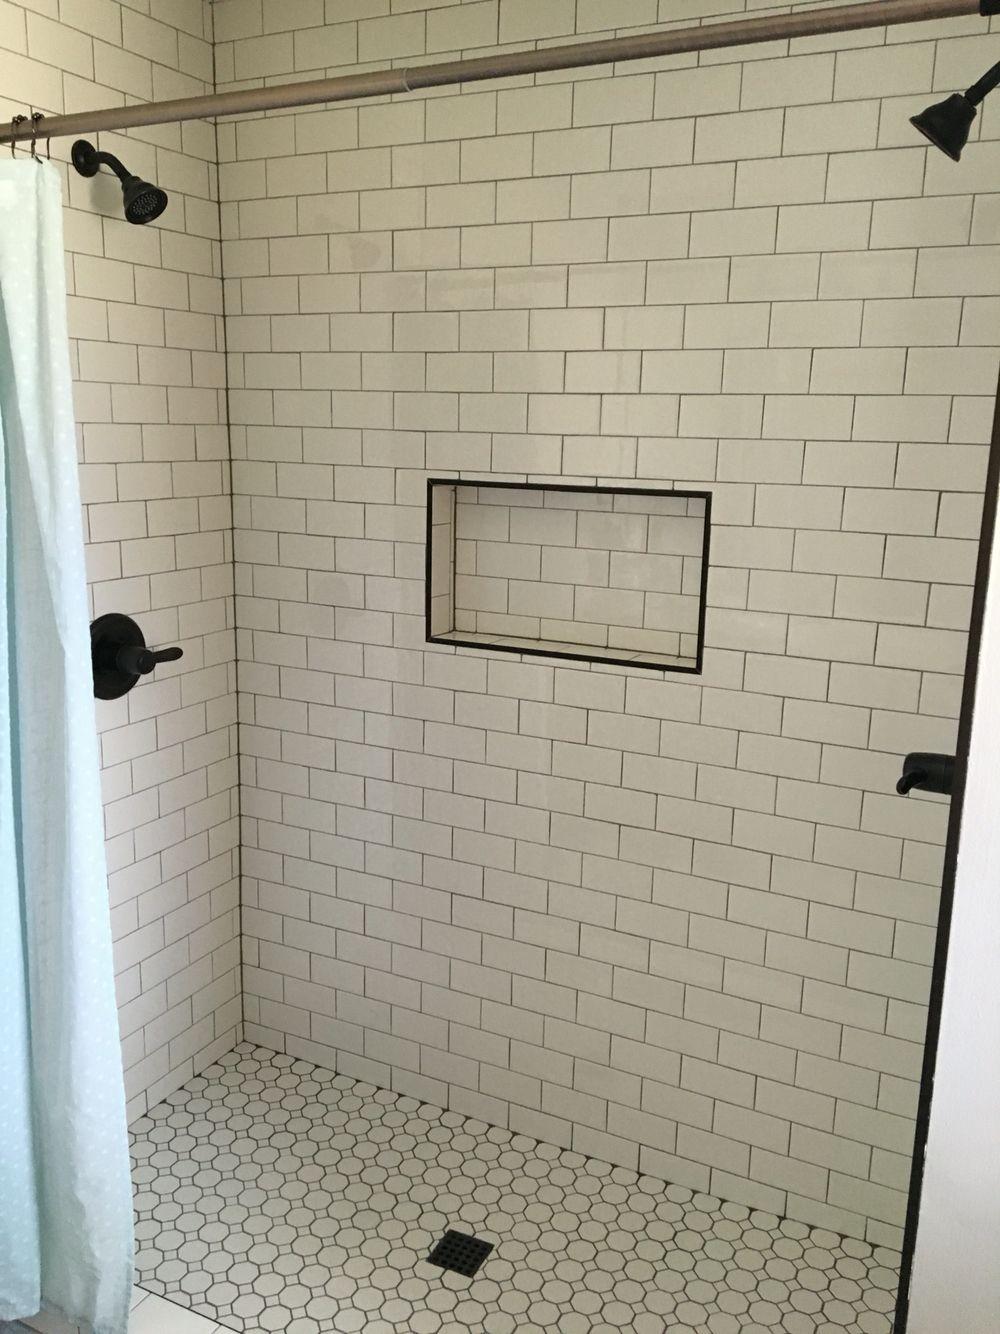 Non Slip Flooring For Kitchens Safe Design Solutions For Senior Friendly Bathrooms Bathroom